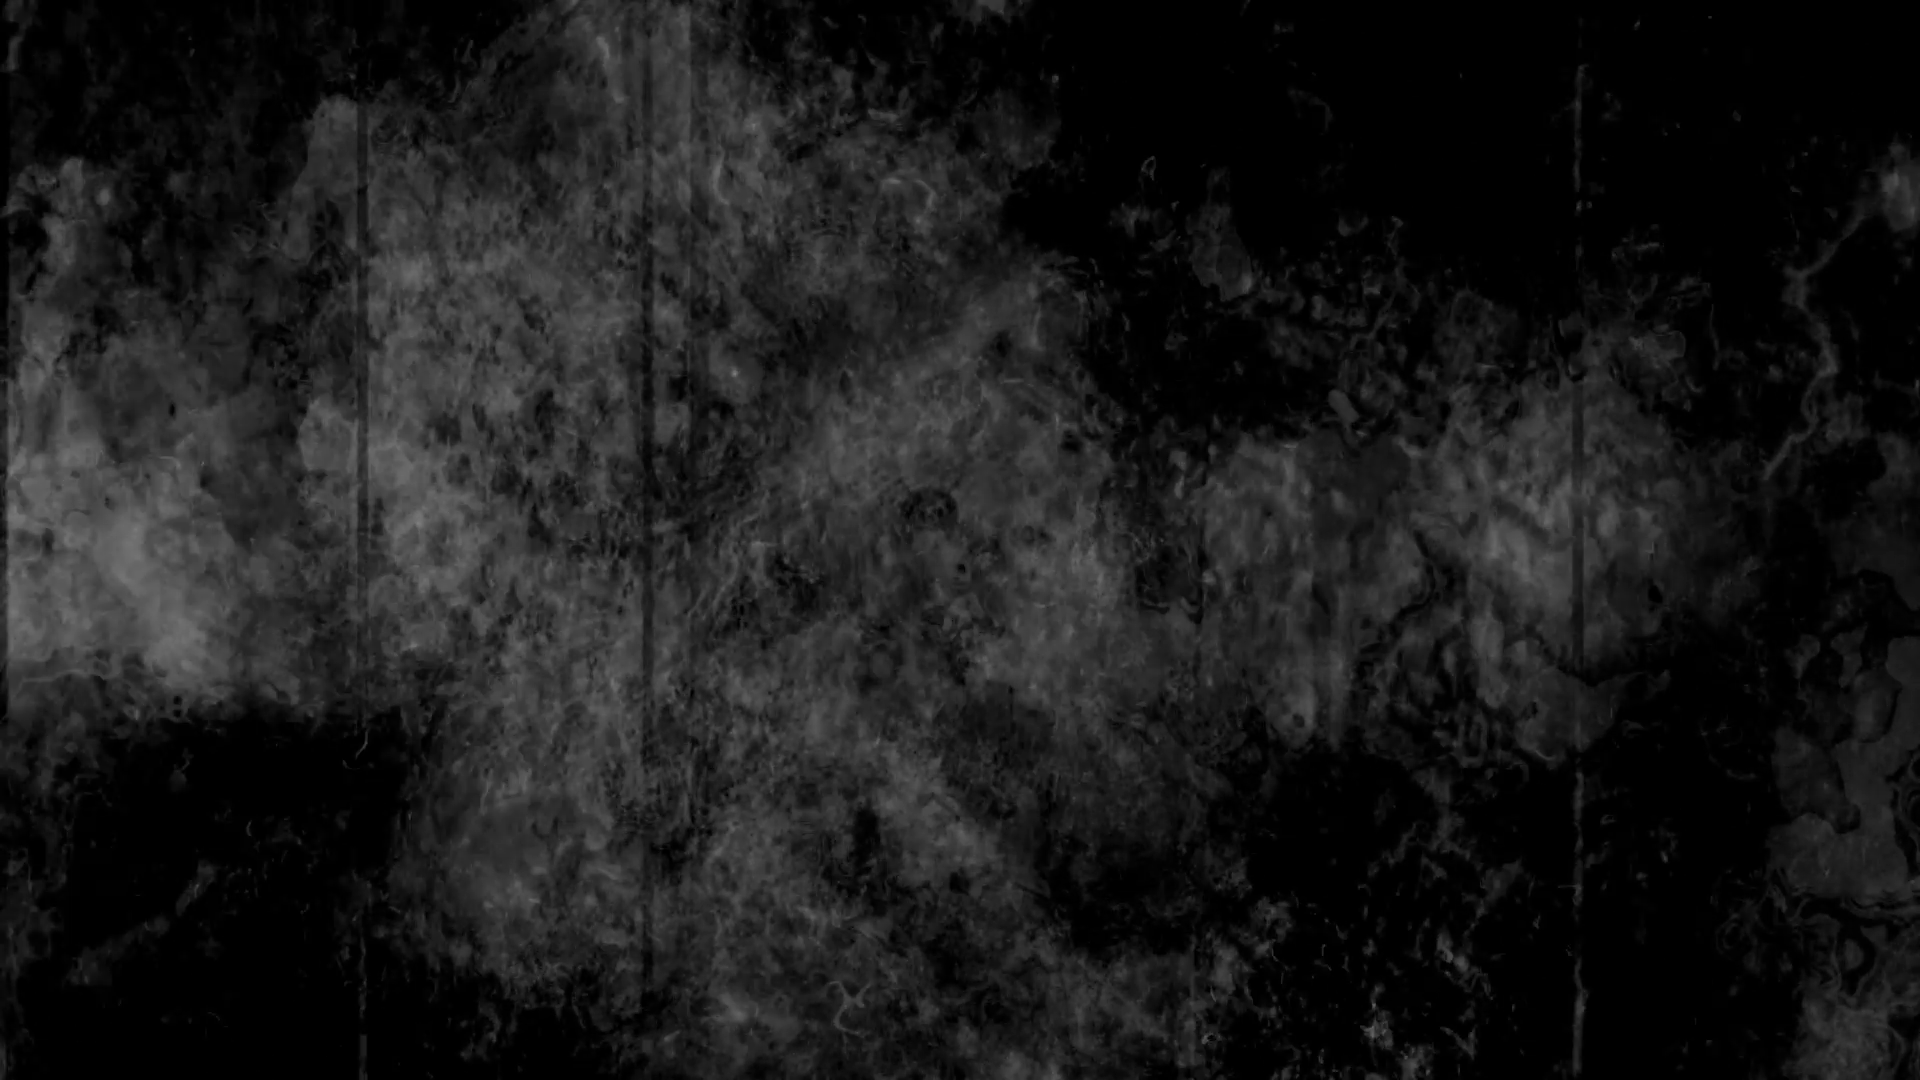 Black and white grunge texture loop Motion Background - VideoBlocks